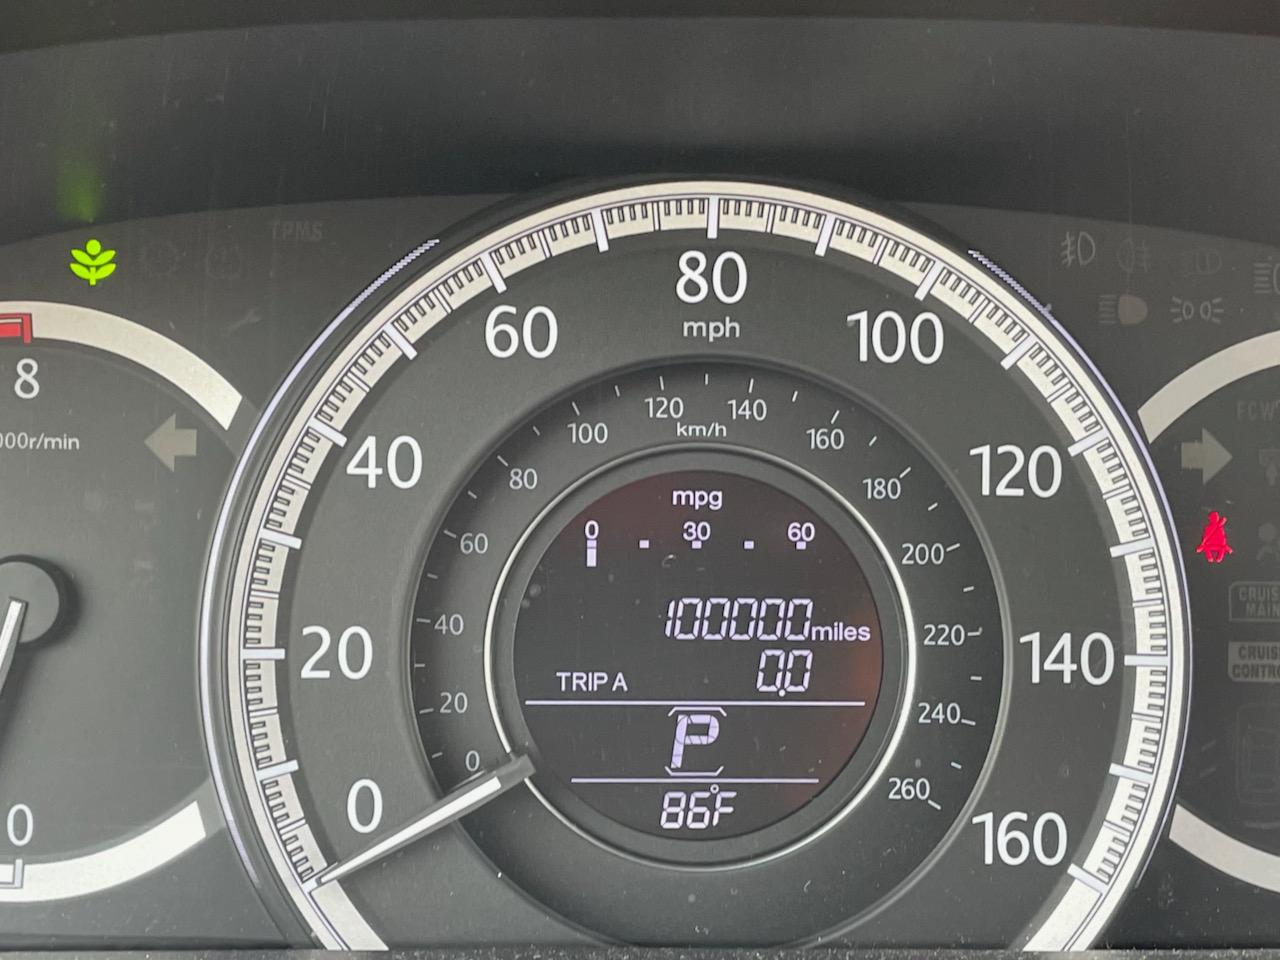 Odometer reading 100,000 miles.